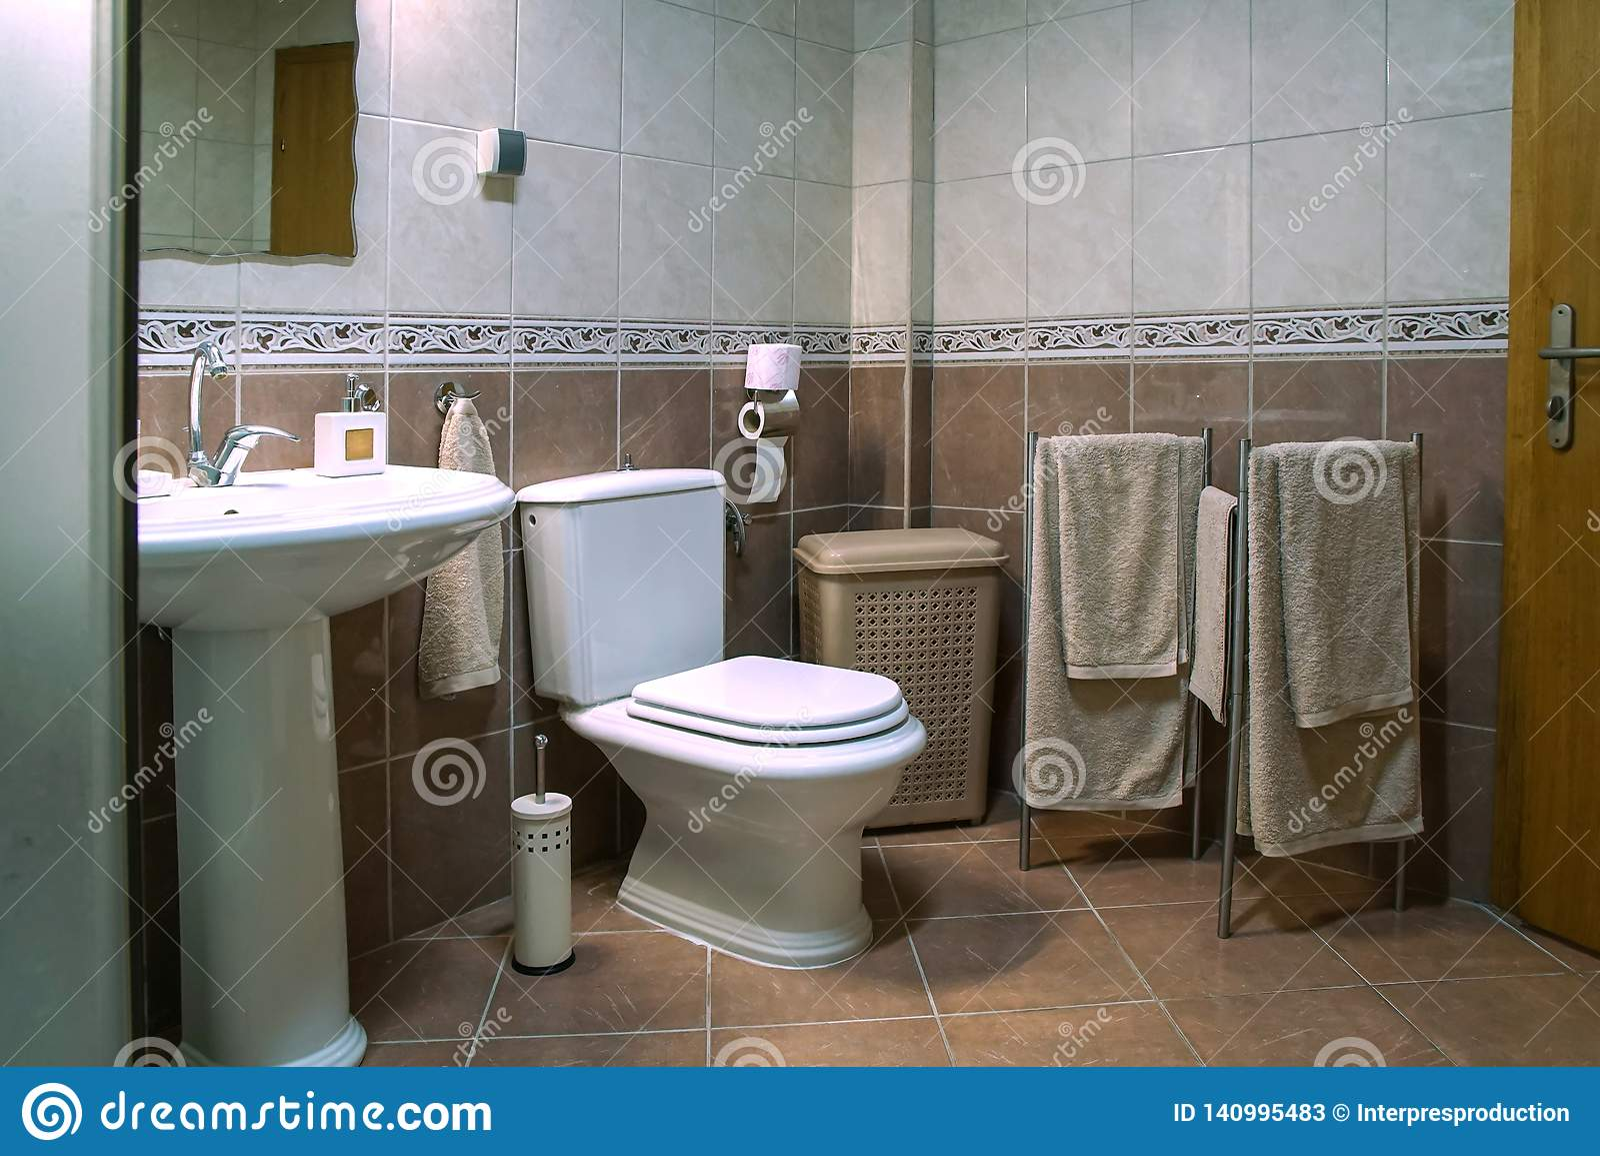 https www dreamstime com modern brown bathroom sink toilet bowl towels tiles white image140995483